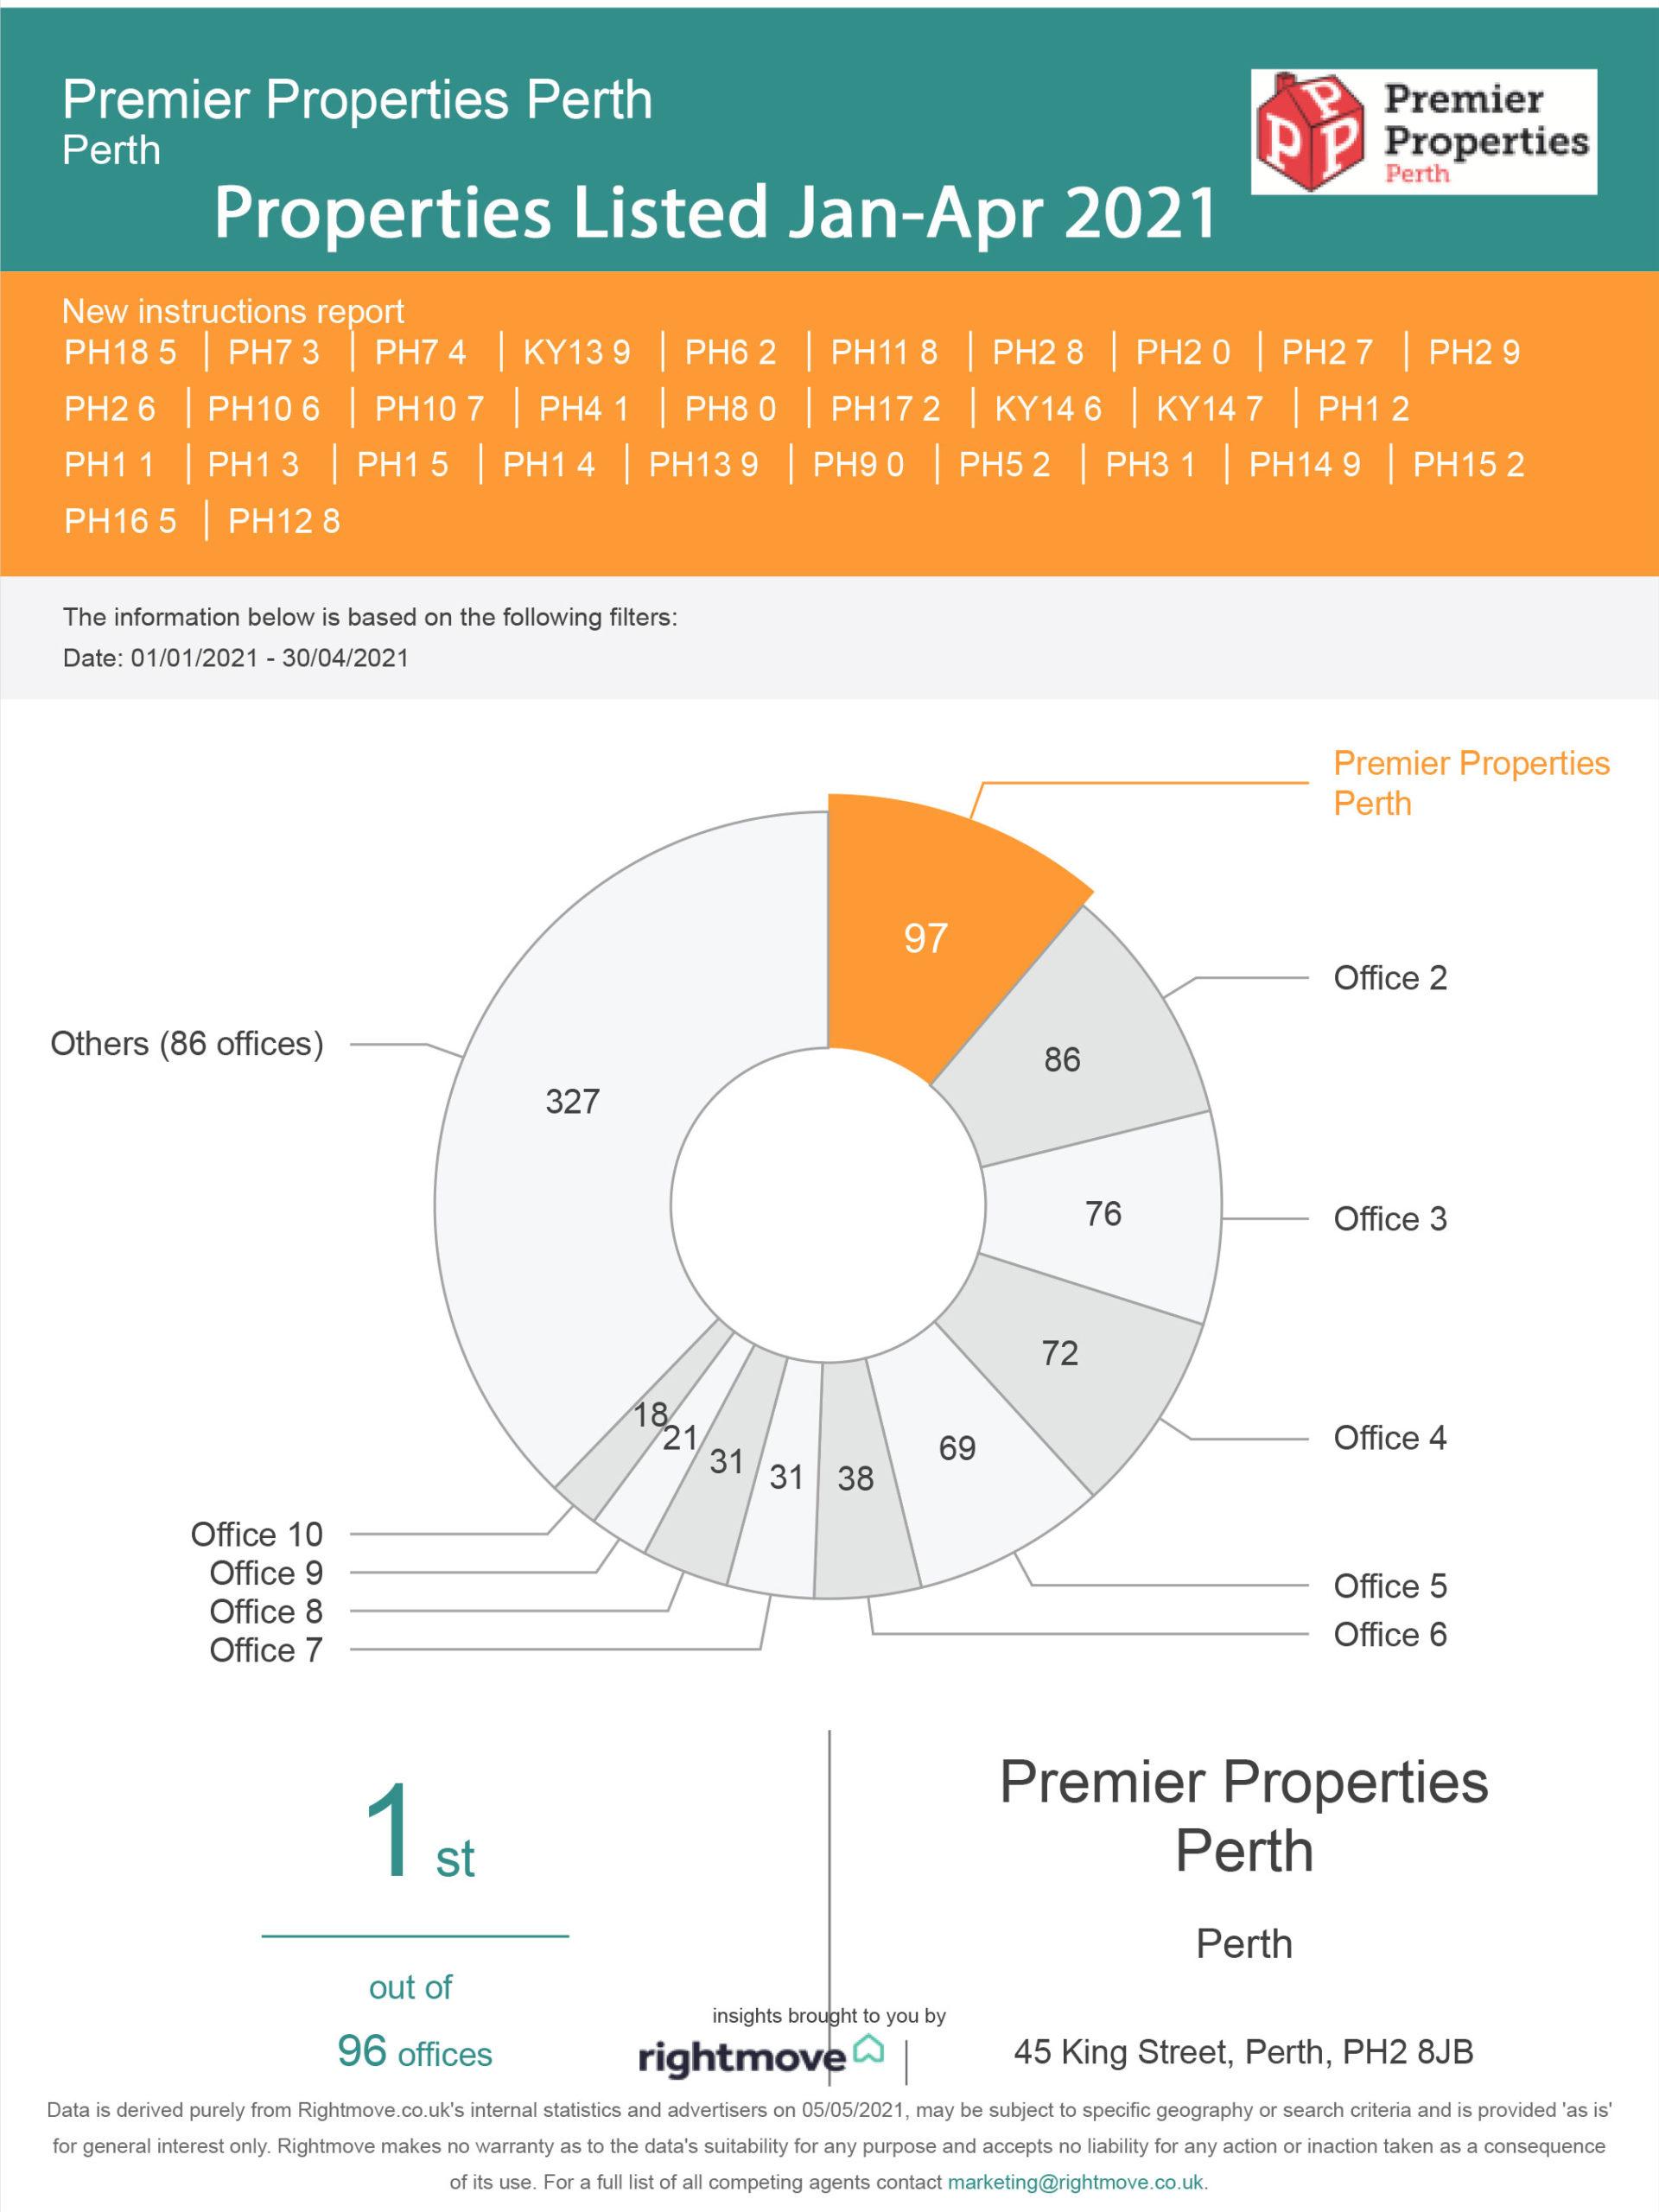 Properties-Listed-in-Perthsire-Jan-April-2021